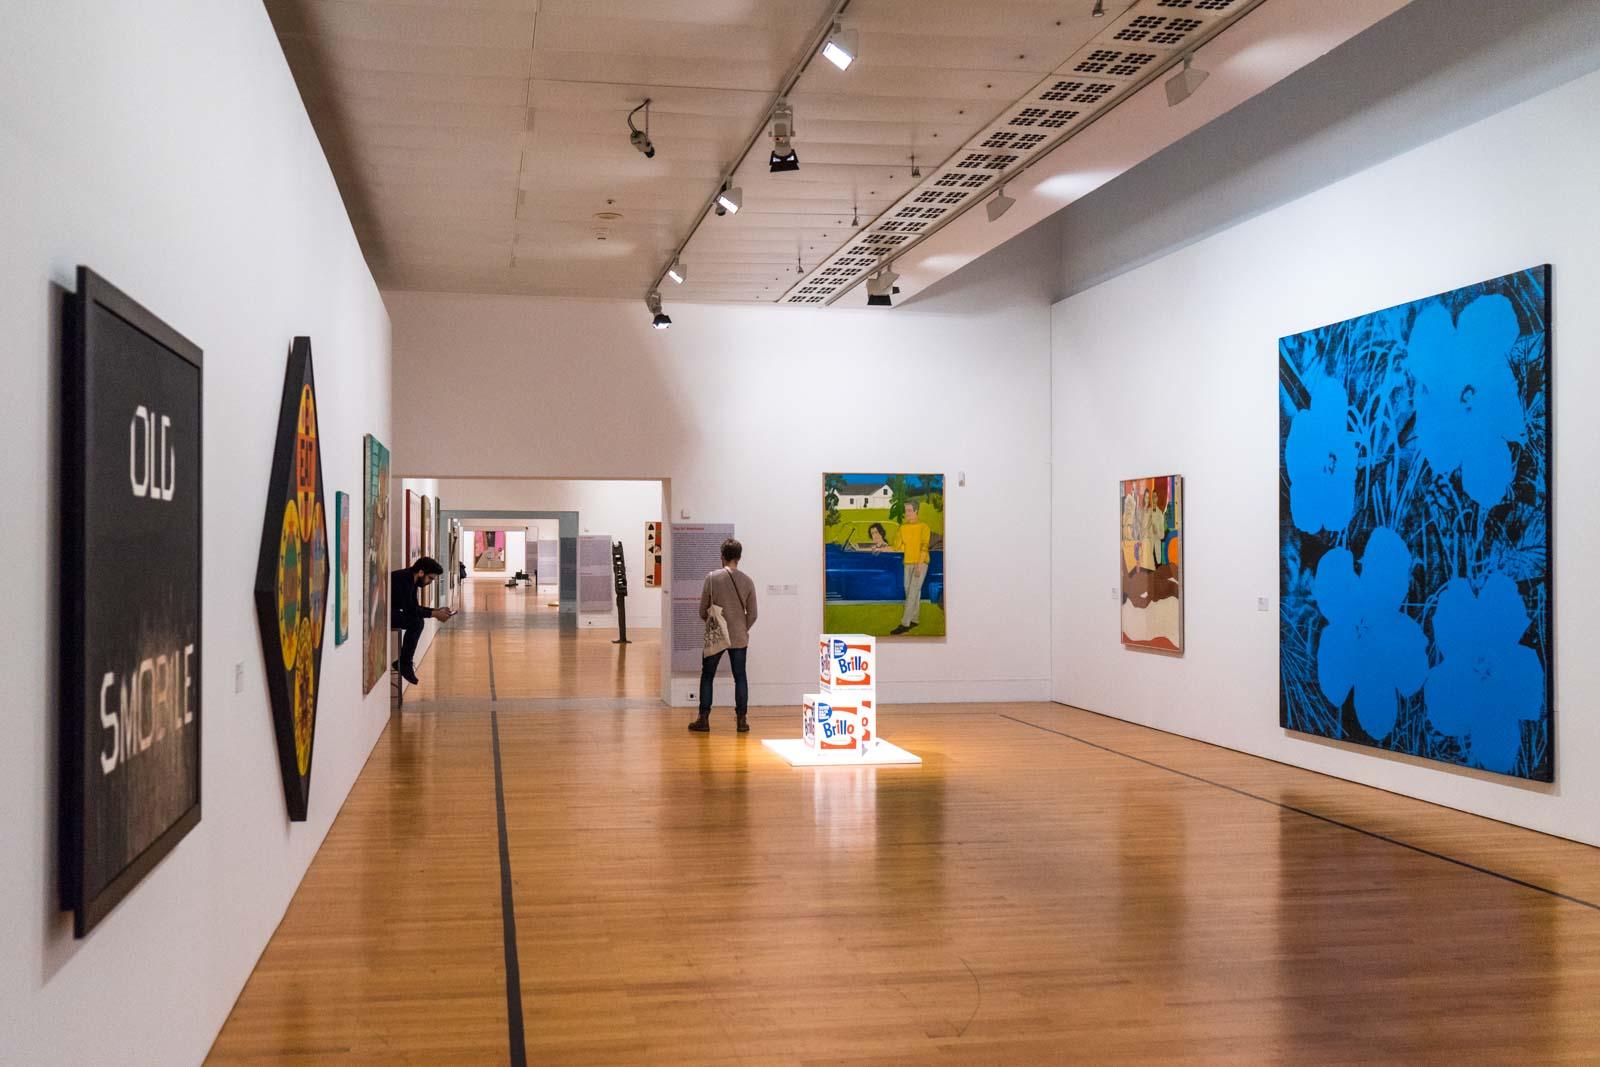 Berardo Collection Museum, Belem, Lisbon, Portugal